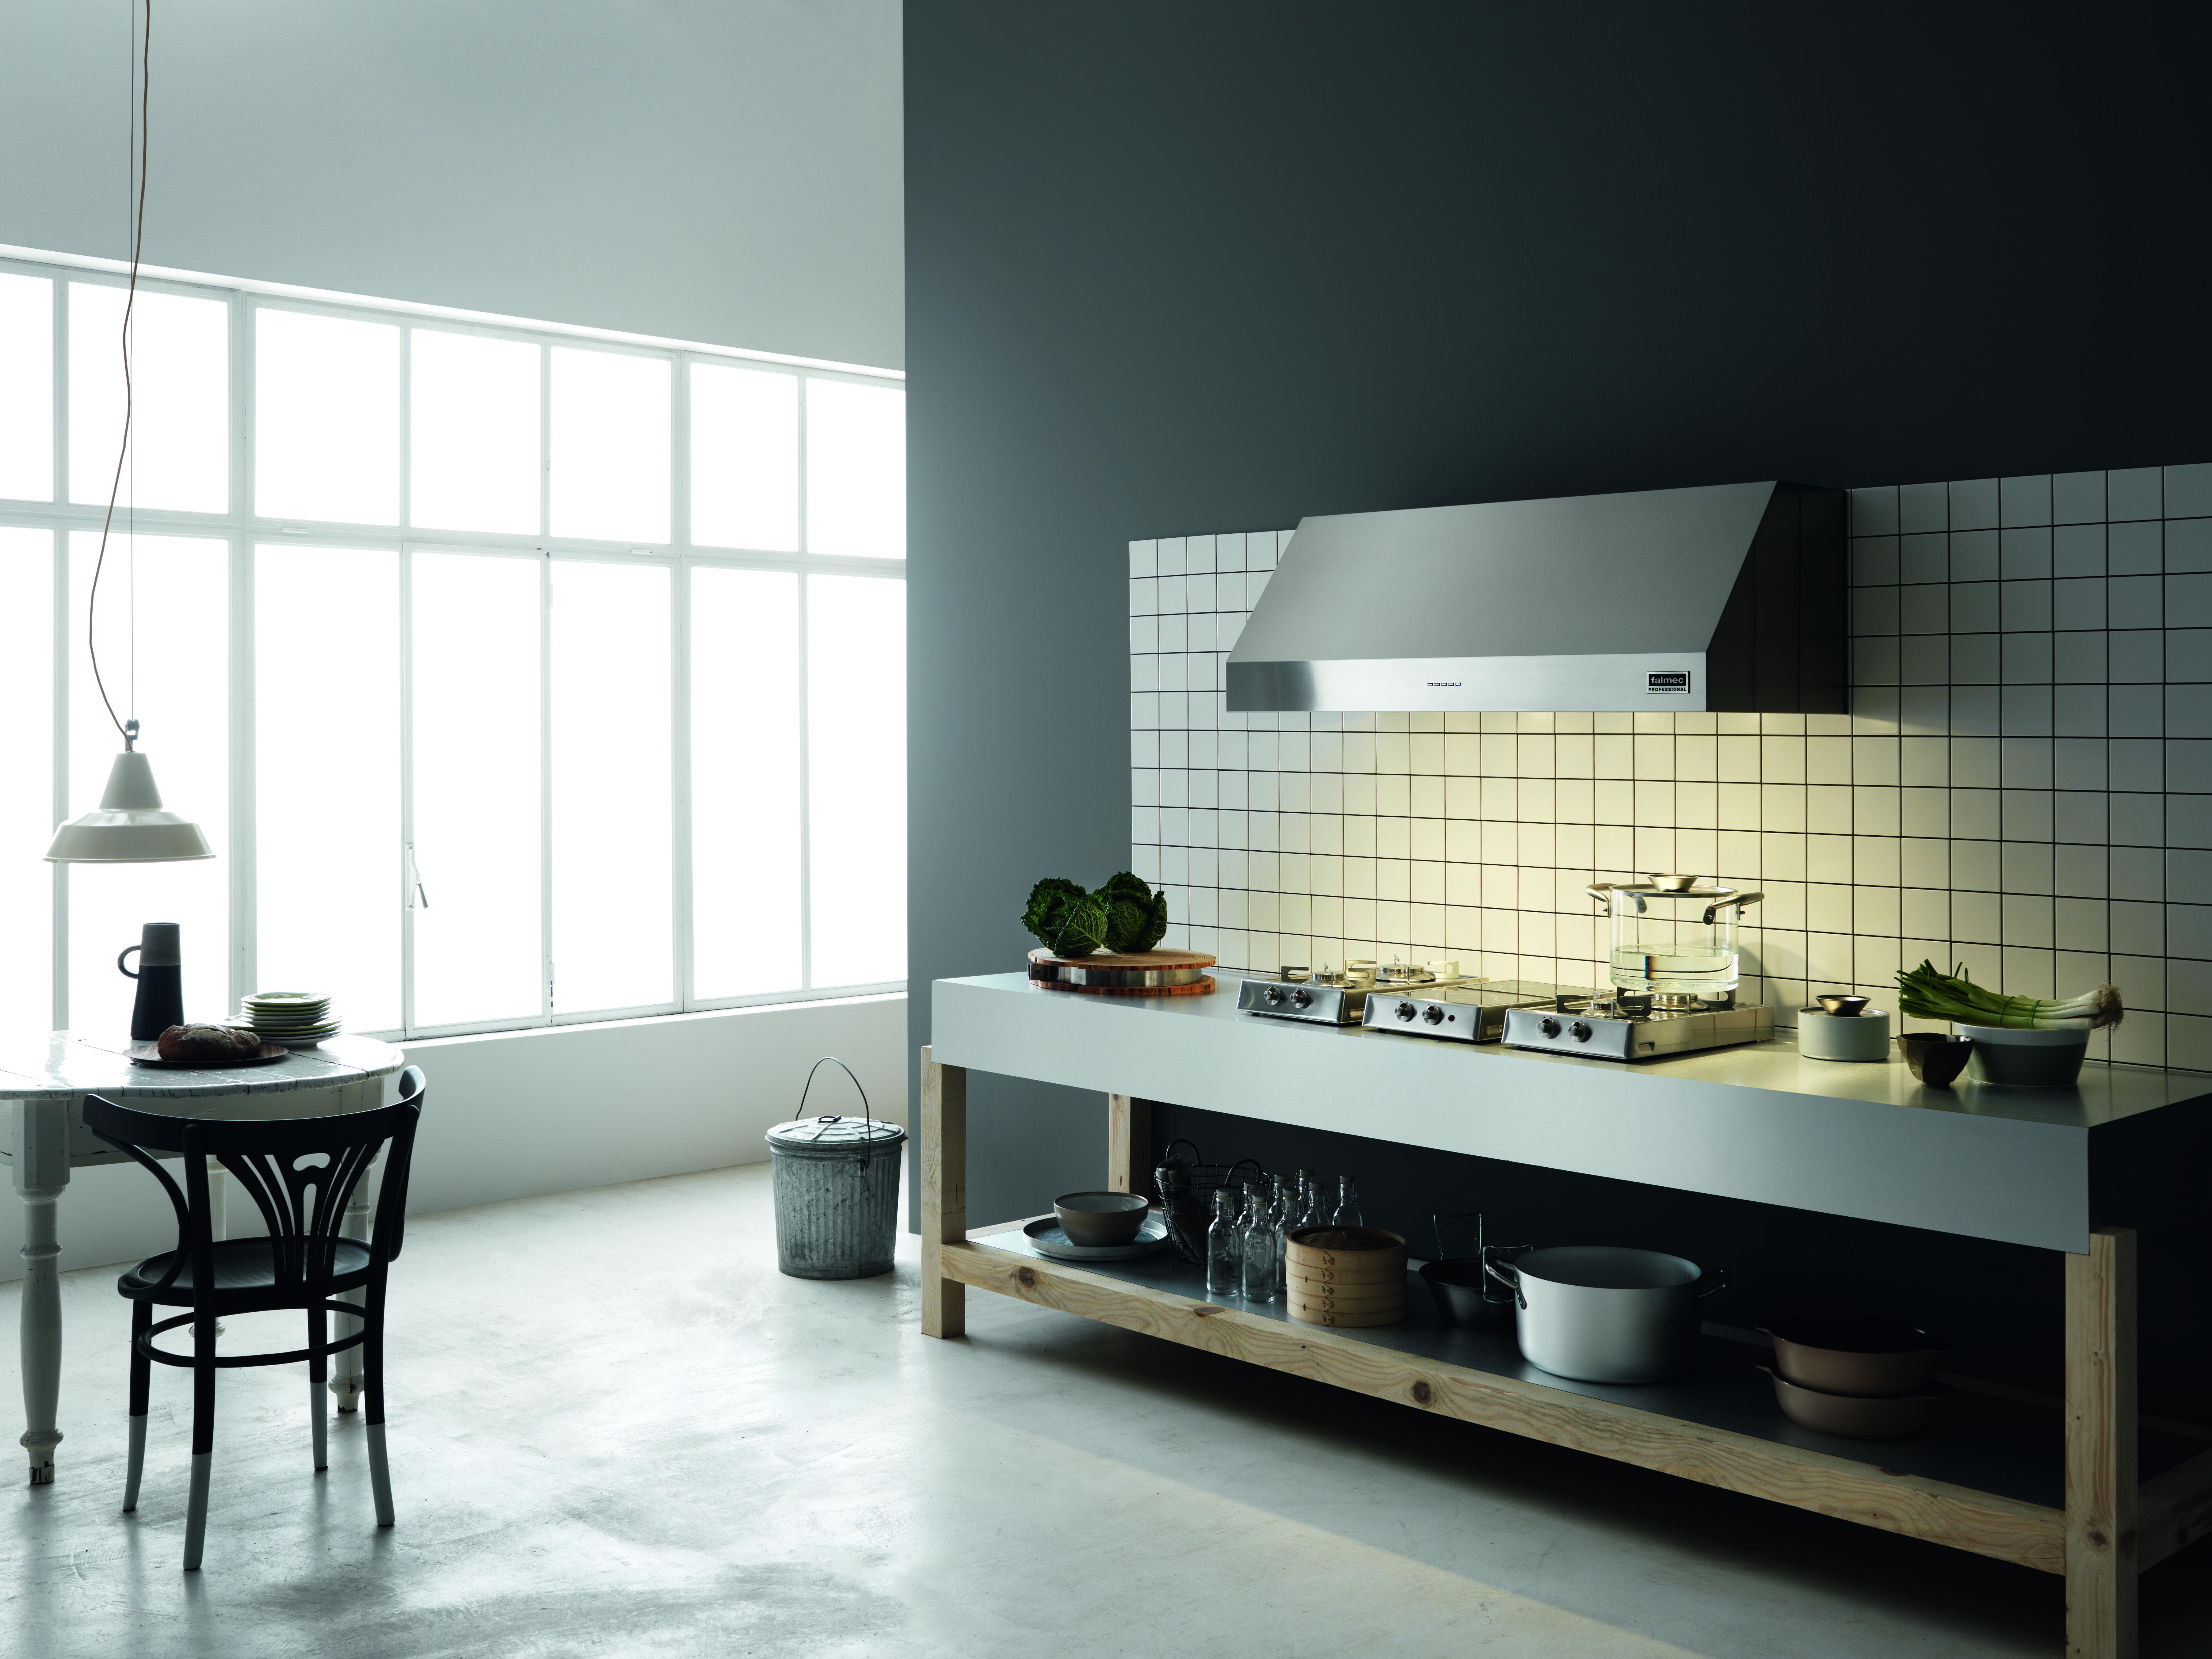 Zeus Architettura D Interni.Zeus Pro Falmec Professional Cucine E Pensili